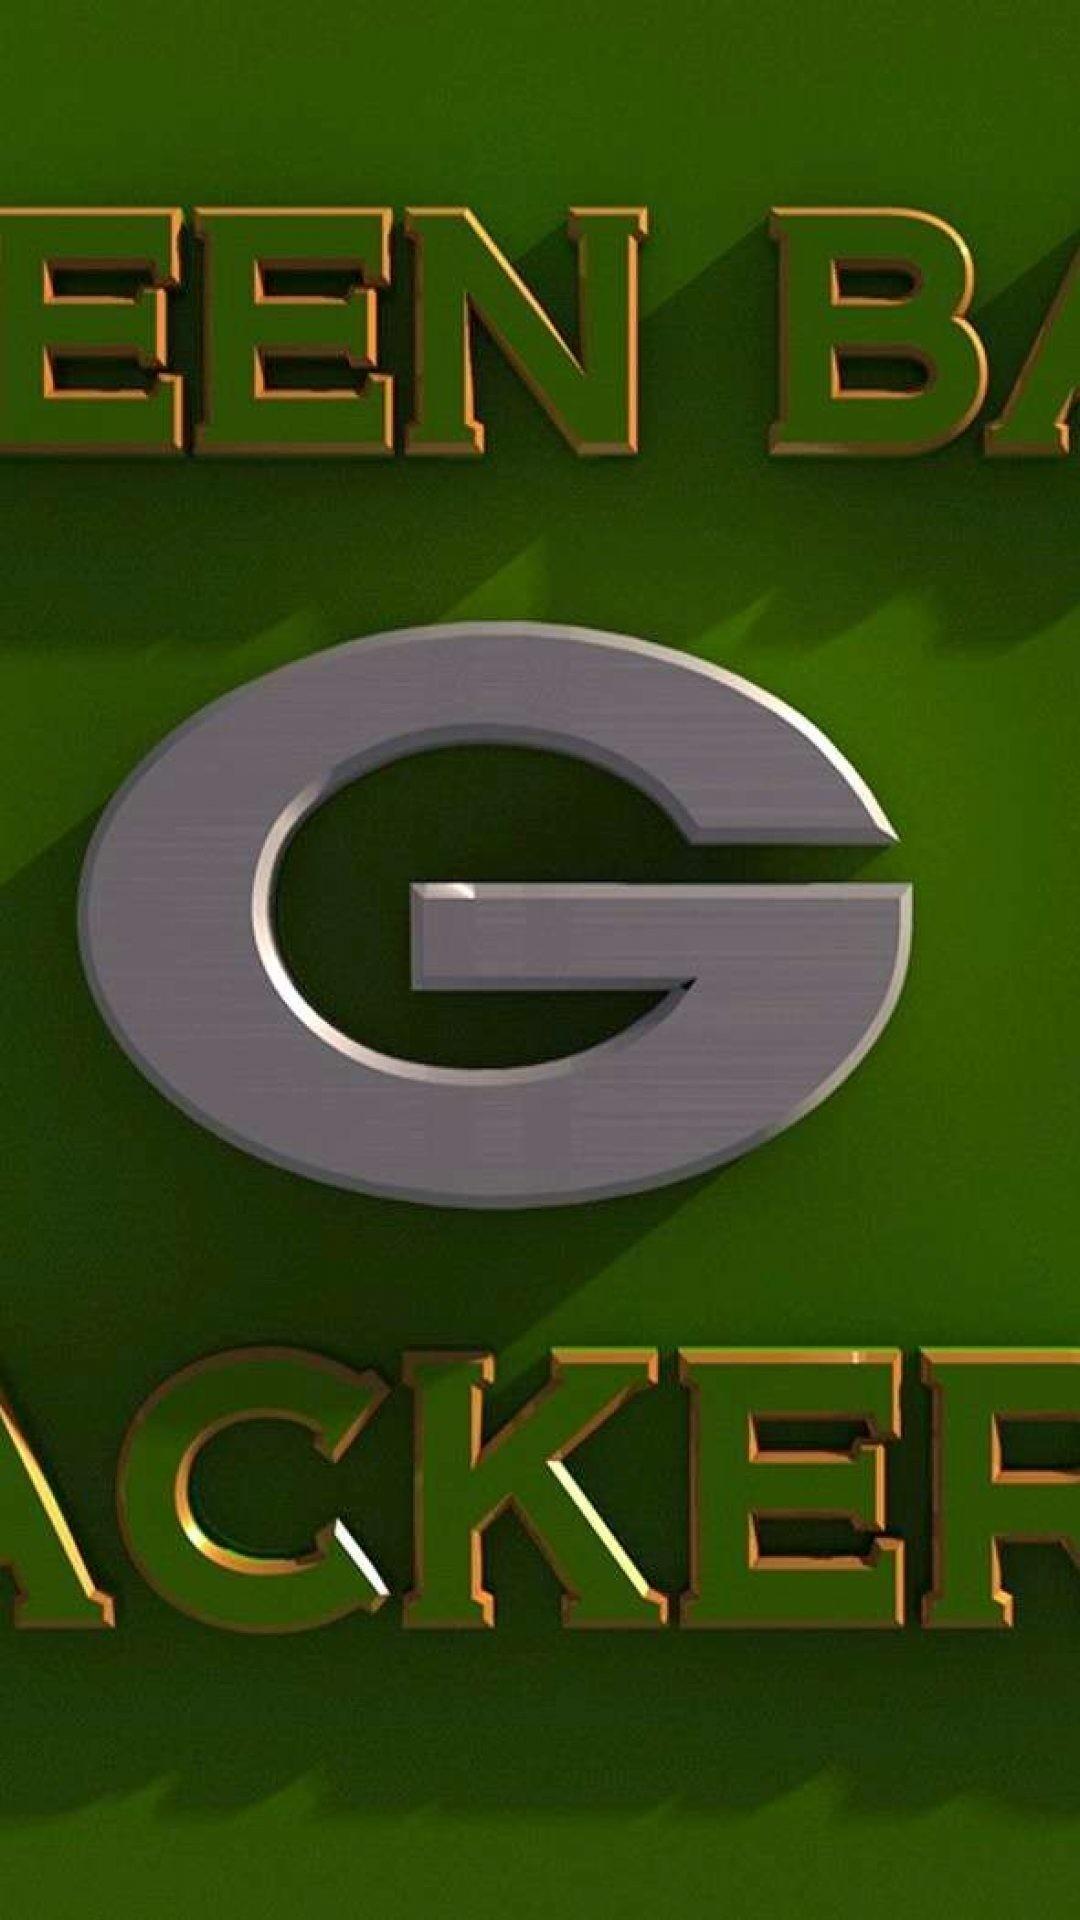 Green Bay Packers Iphone X Wallpaper Green Bay Packers Images Wallpaper Logo 64 Images